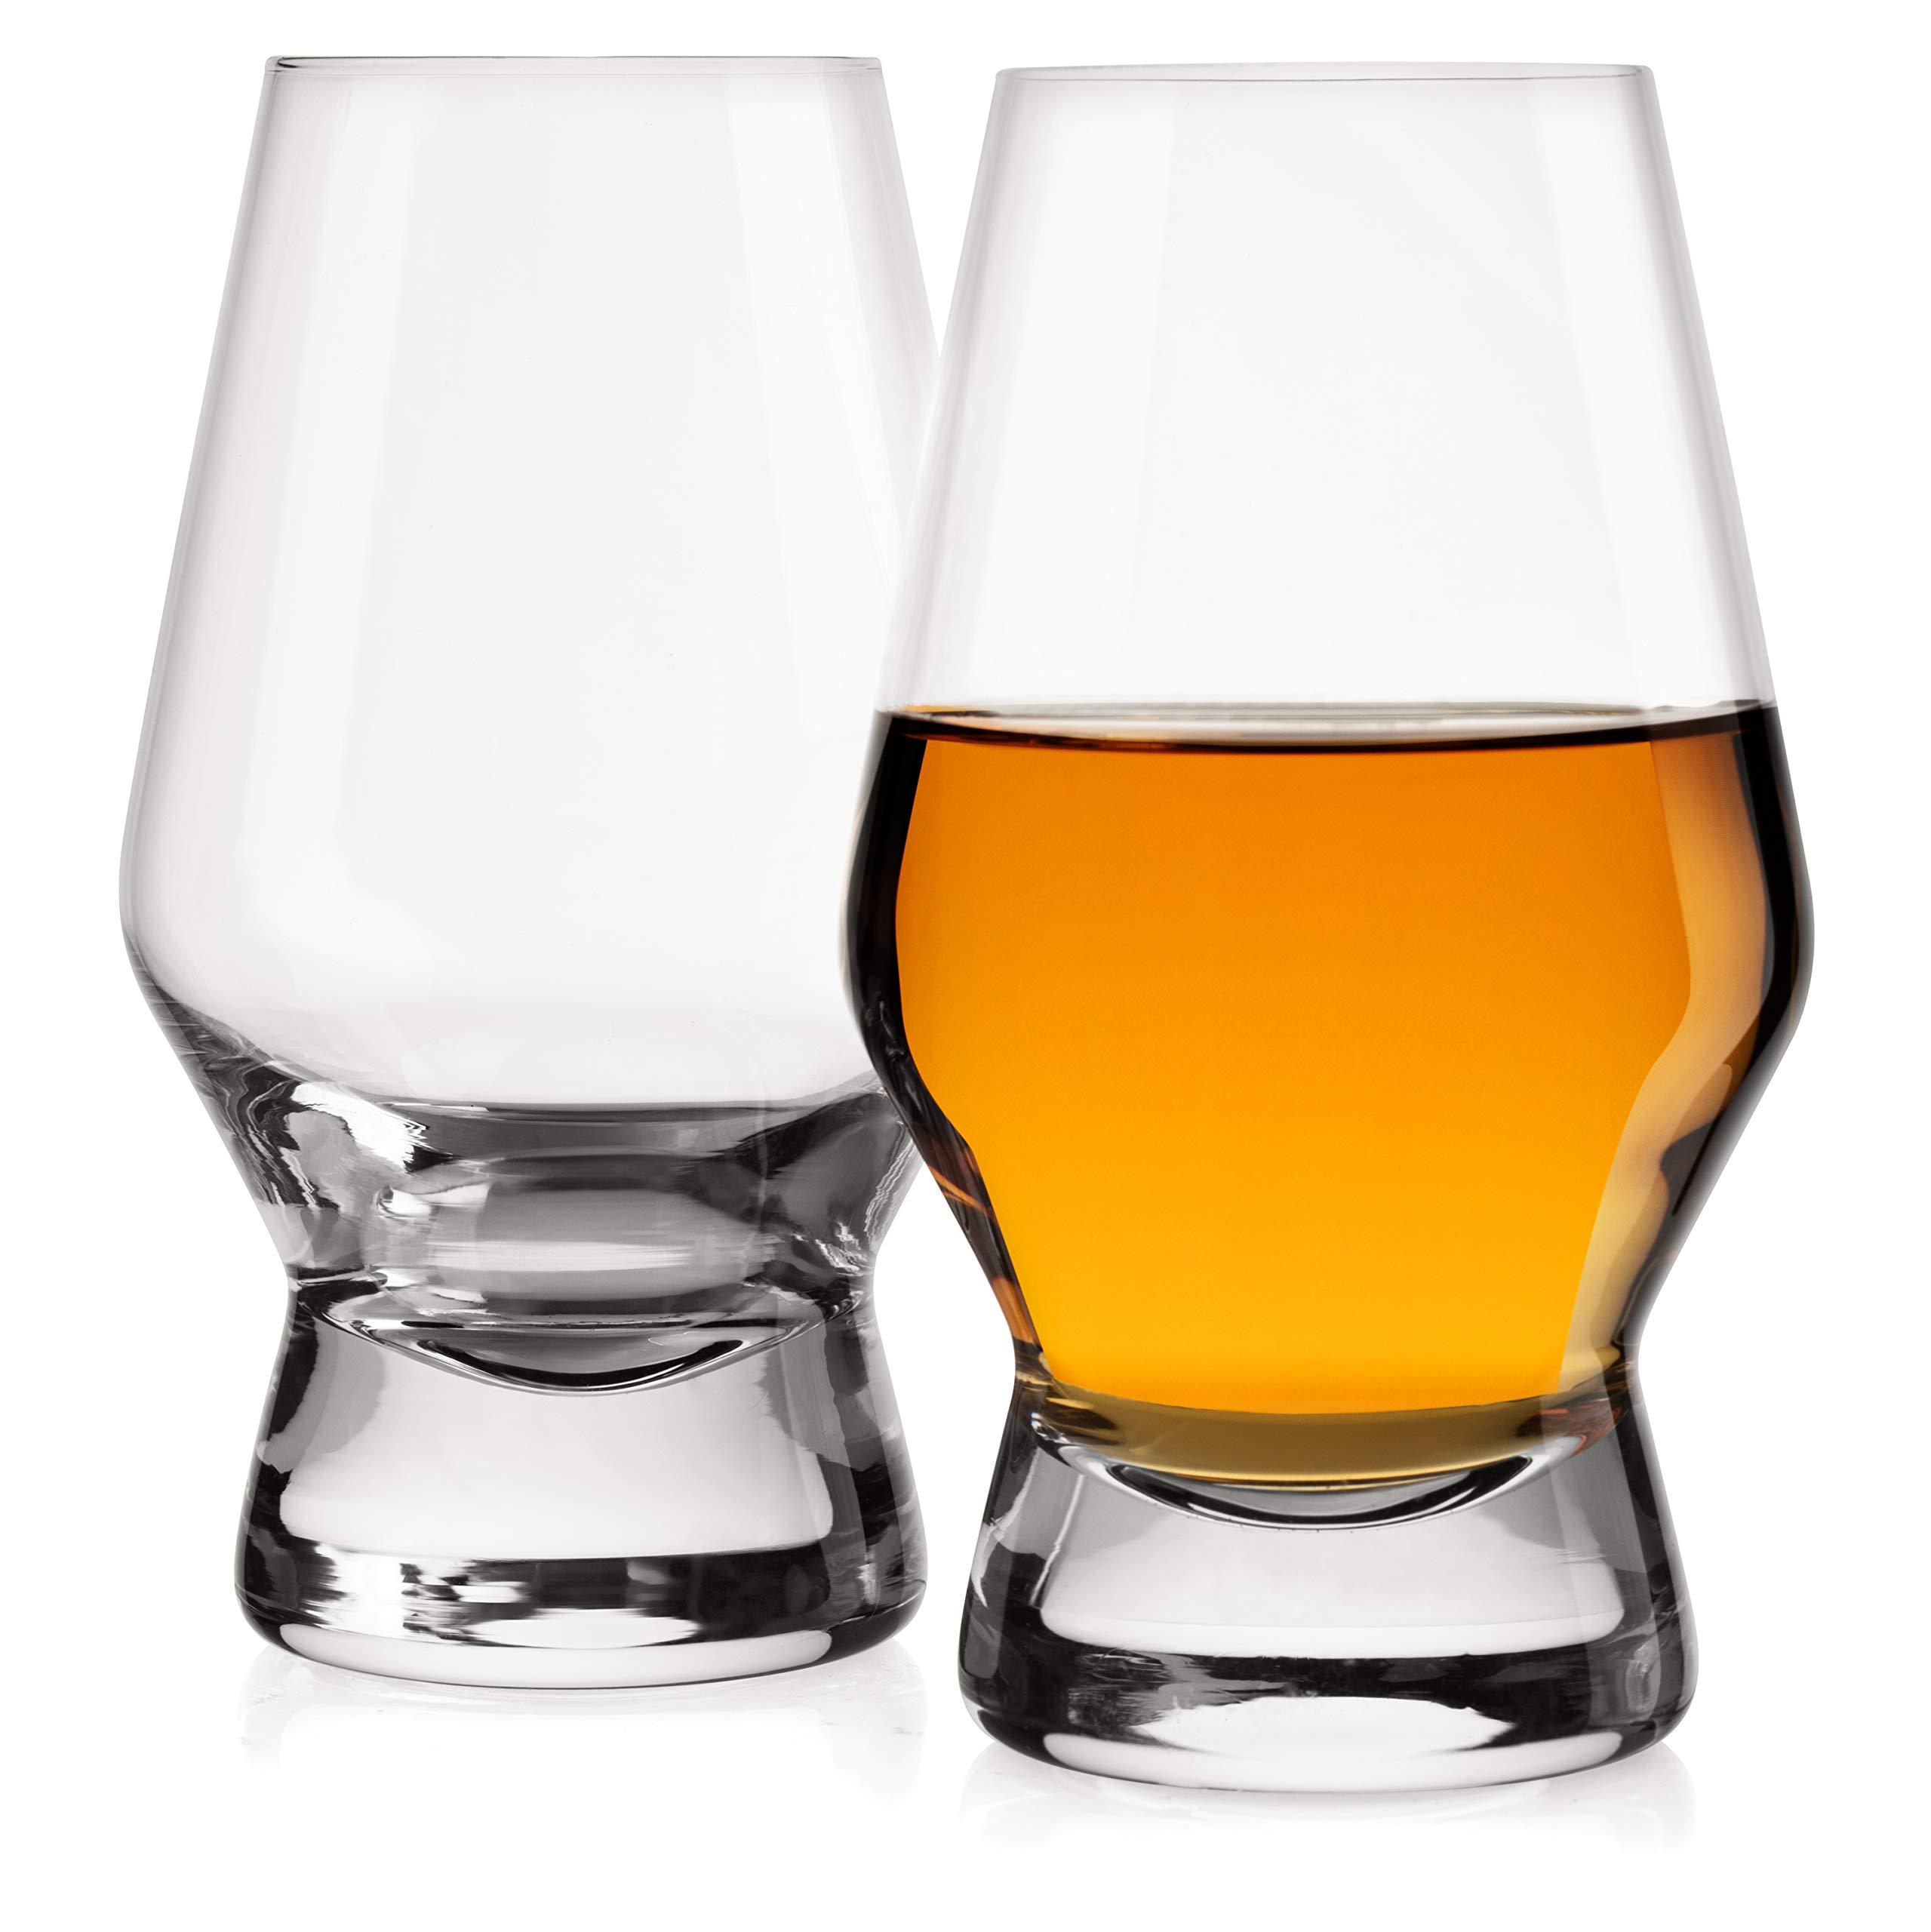 JoyJolt Halo Crystal Whiskey/Scotch Glasses set of 2. Perfect Whisky Glass for Liquor or Bourbon Tumblers. 7.8 Once Whiskey Glasses. by JoyJolt